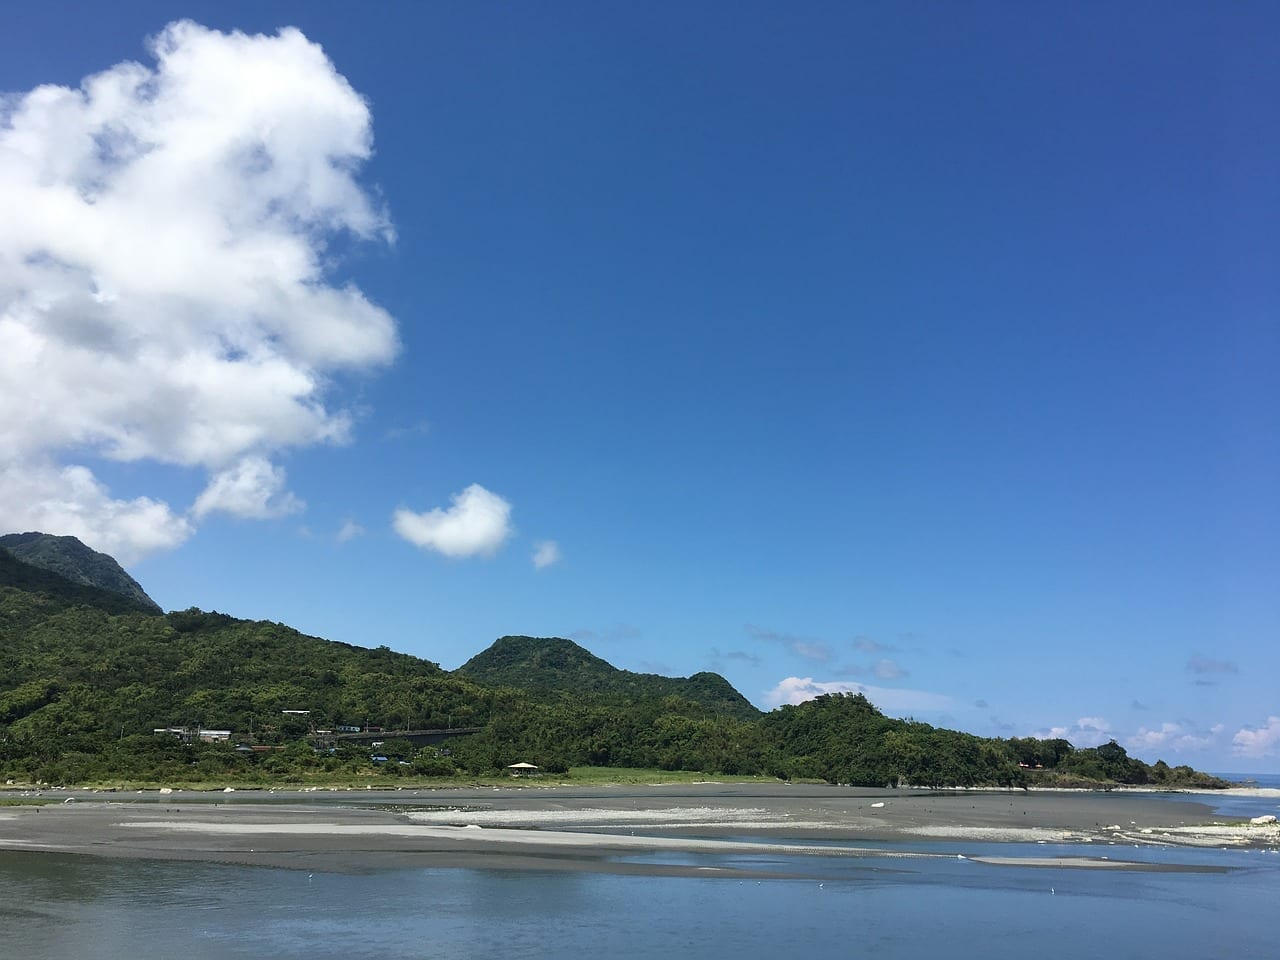 Puerto Hualien Mar Taiwán